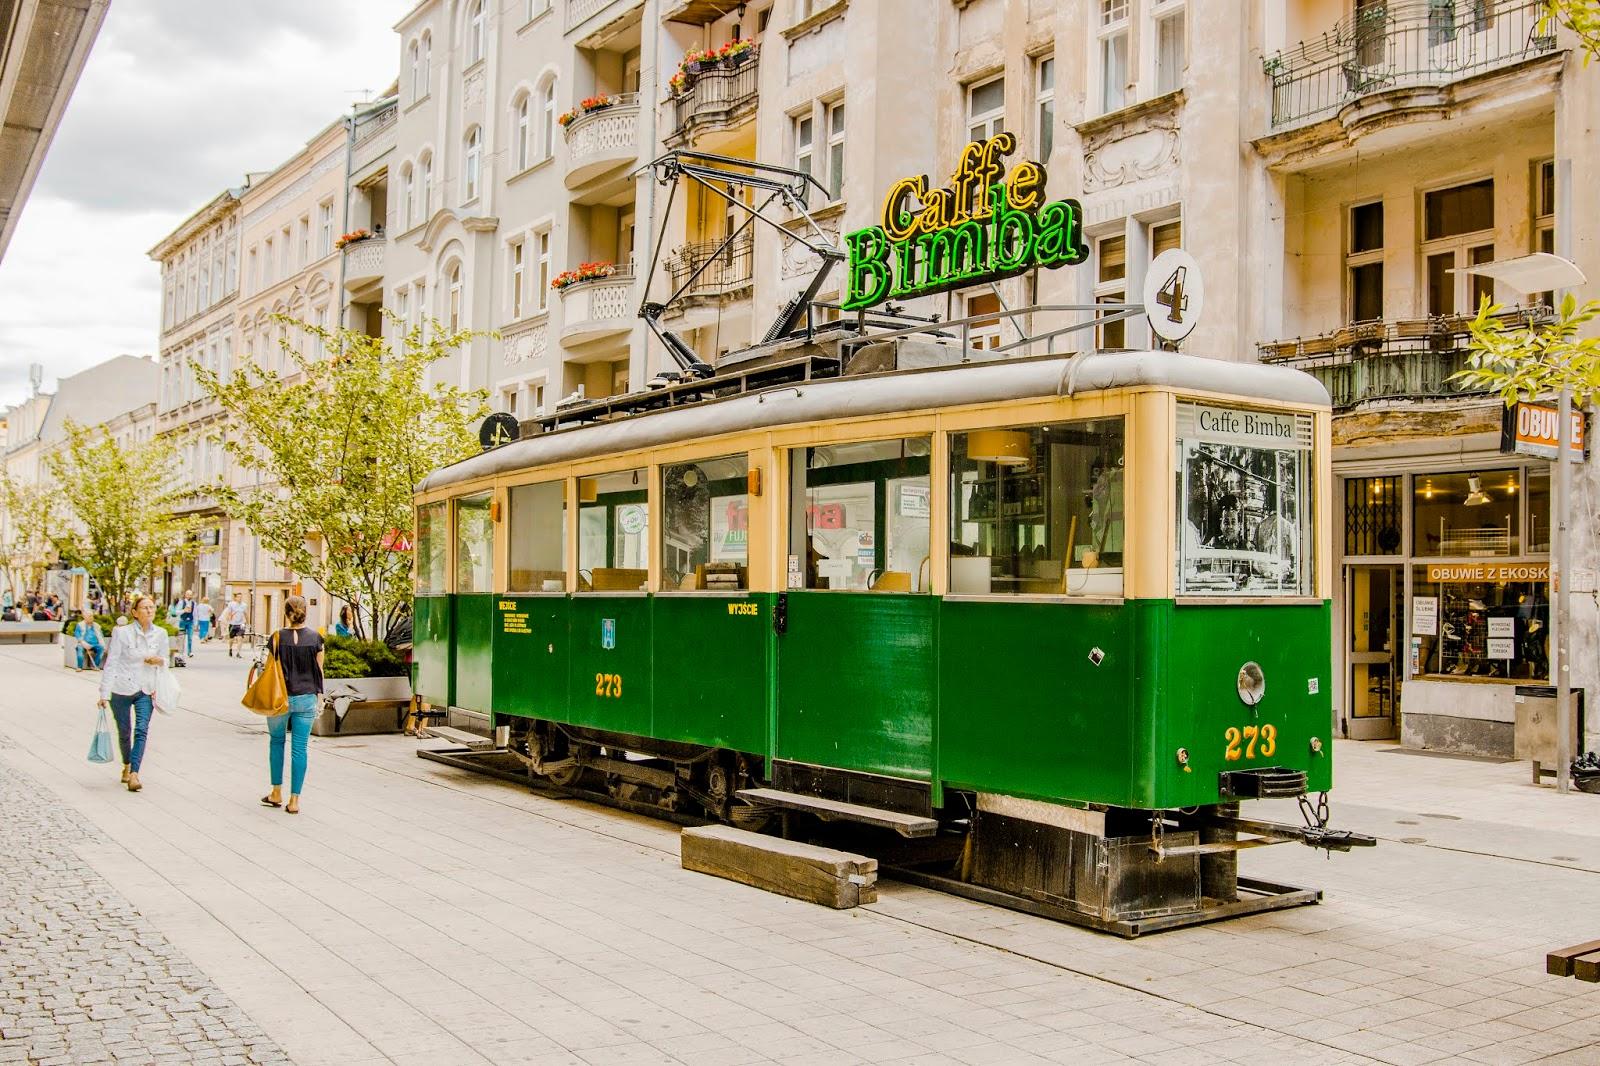 Bimba, tramwaj w Poznaniu